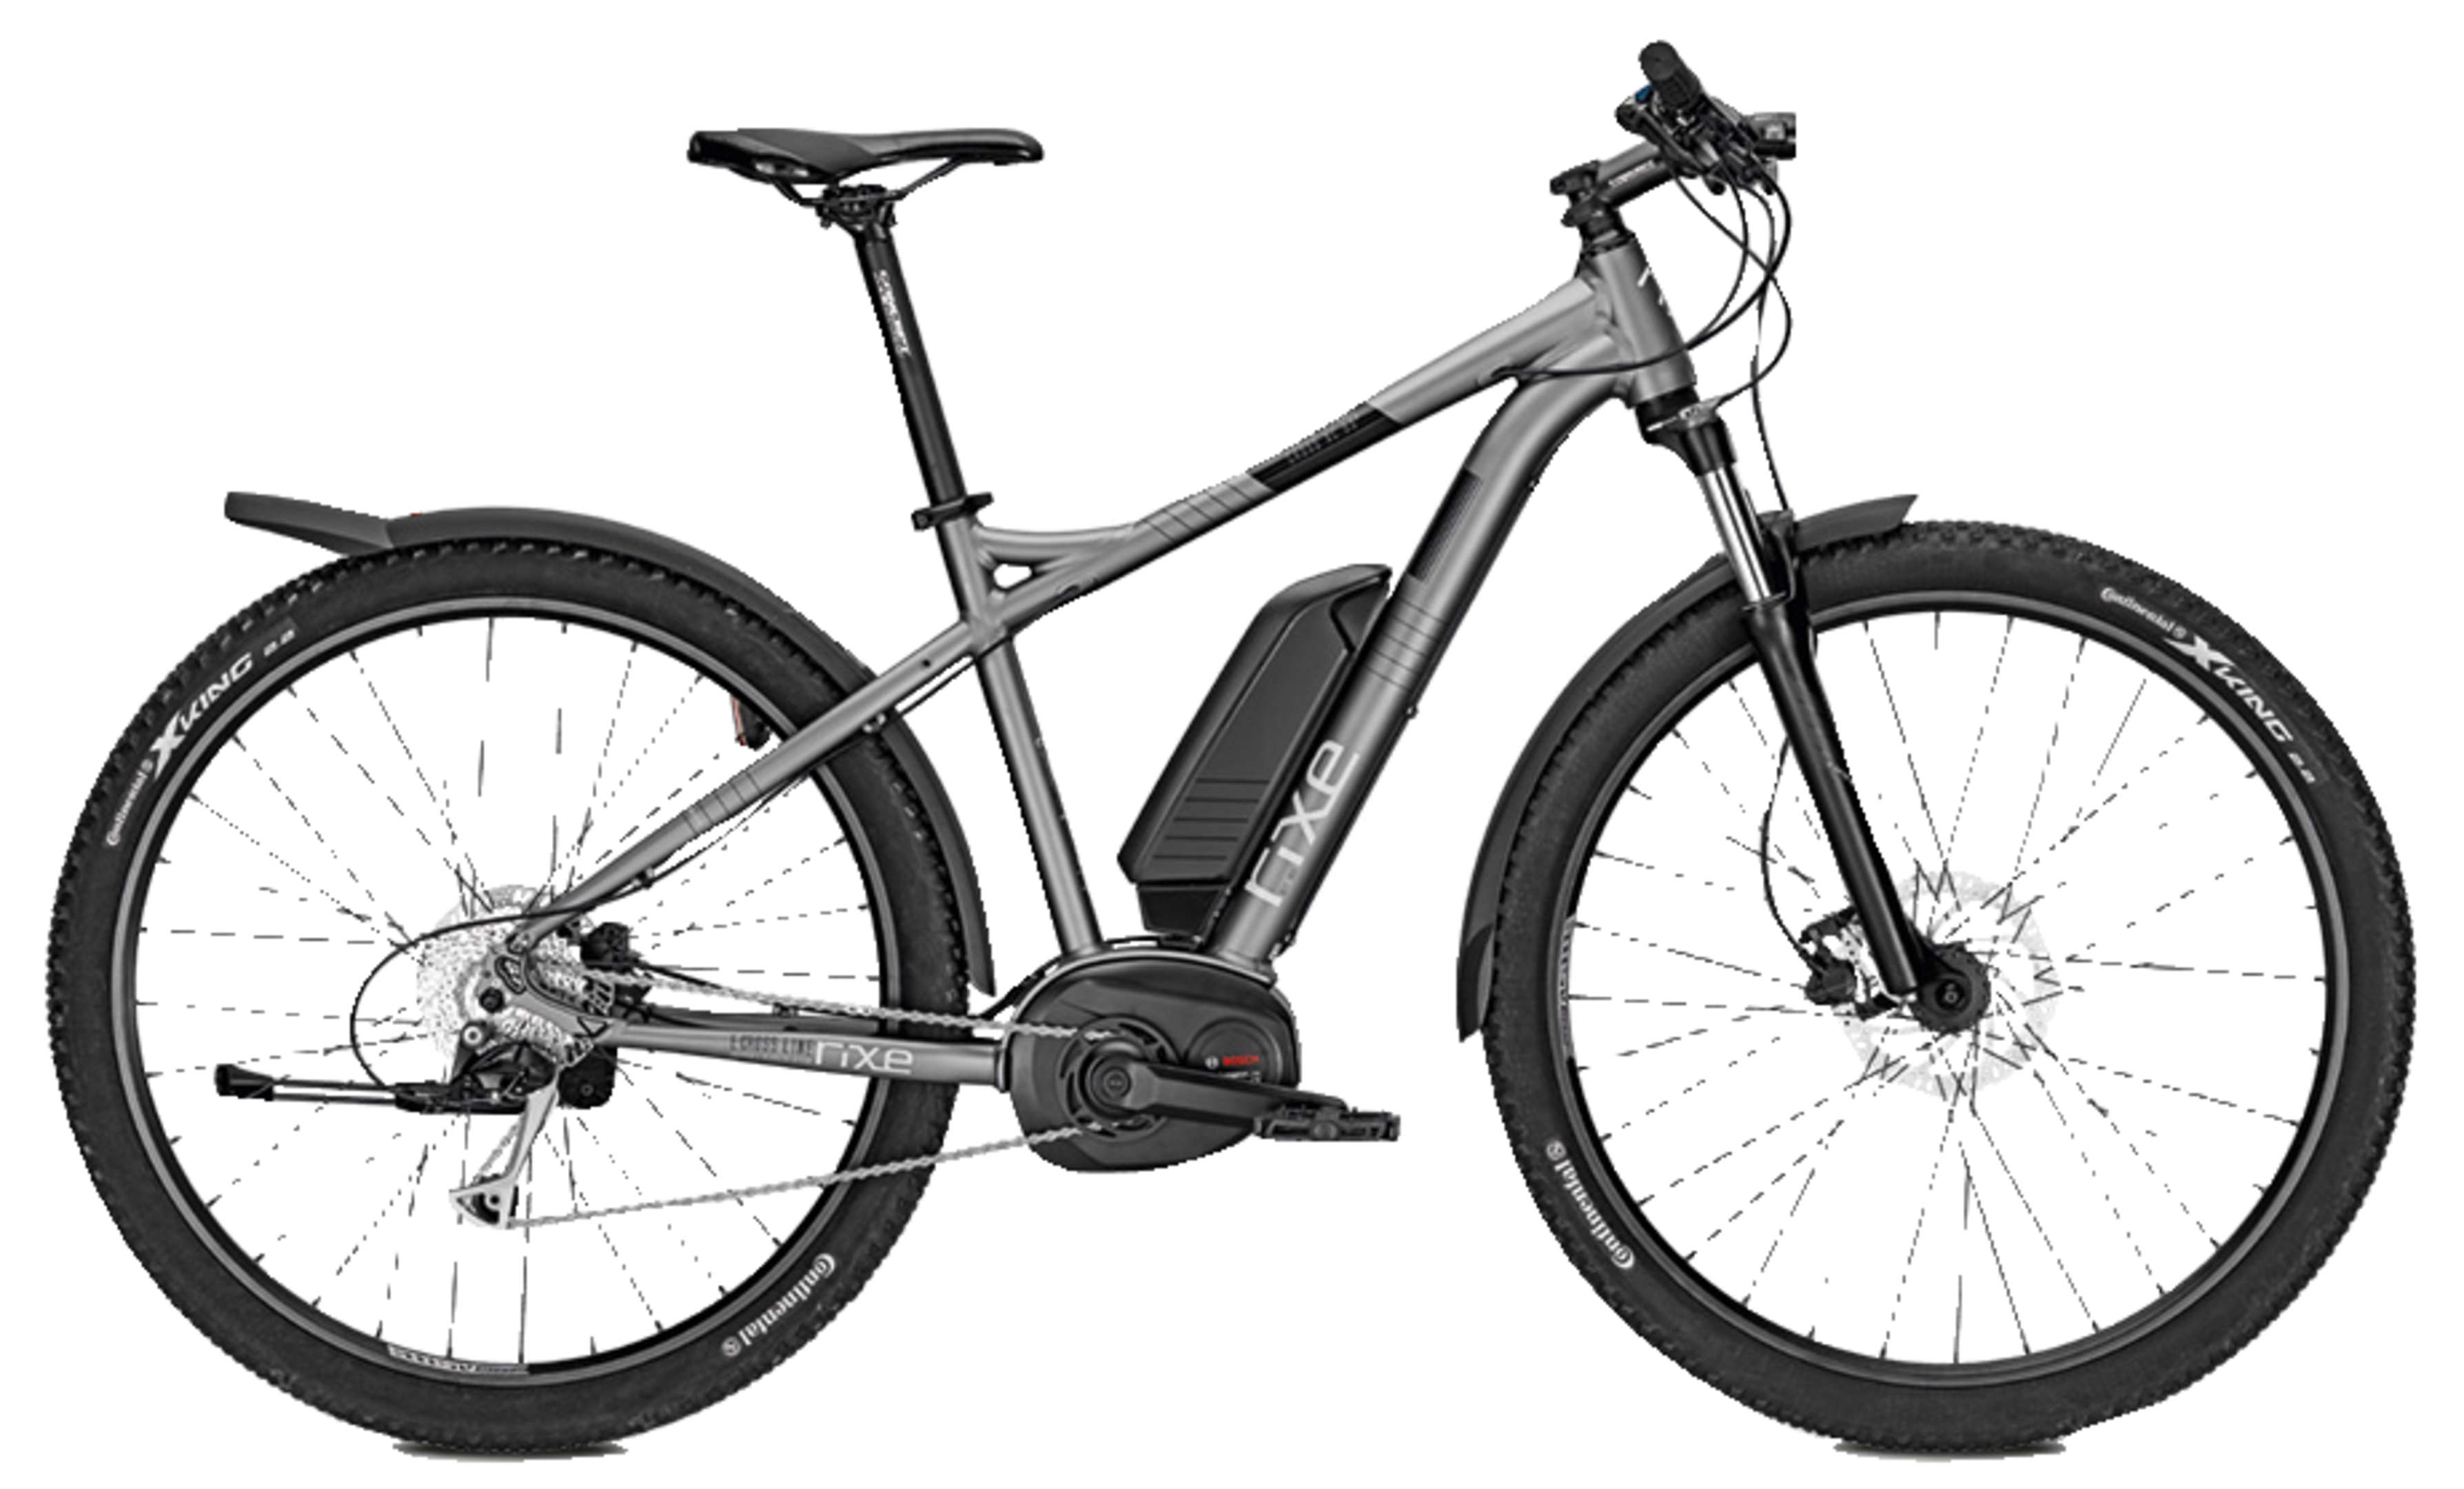 rixe e bike cross xc b9 pro eurorad bikeleasingeurorad. Black Bedroom Furniture Sets. Home Design Ideas